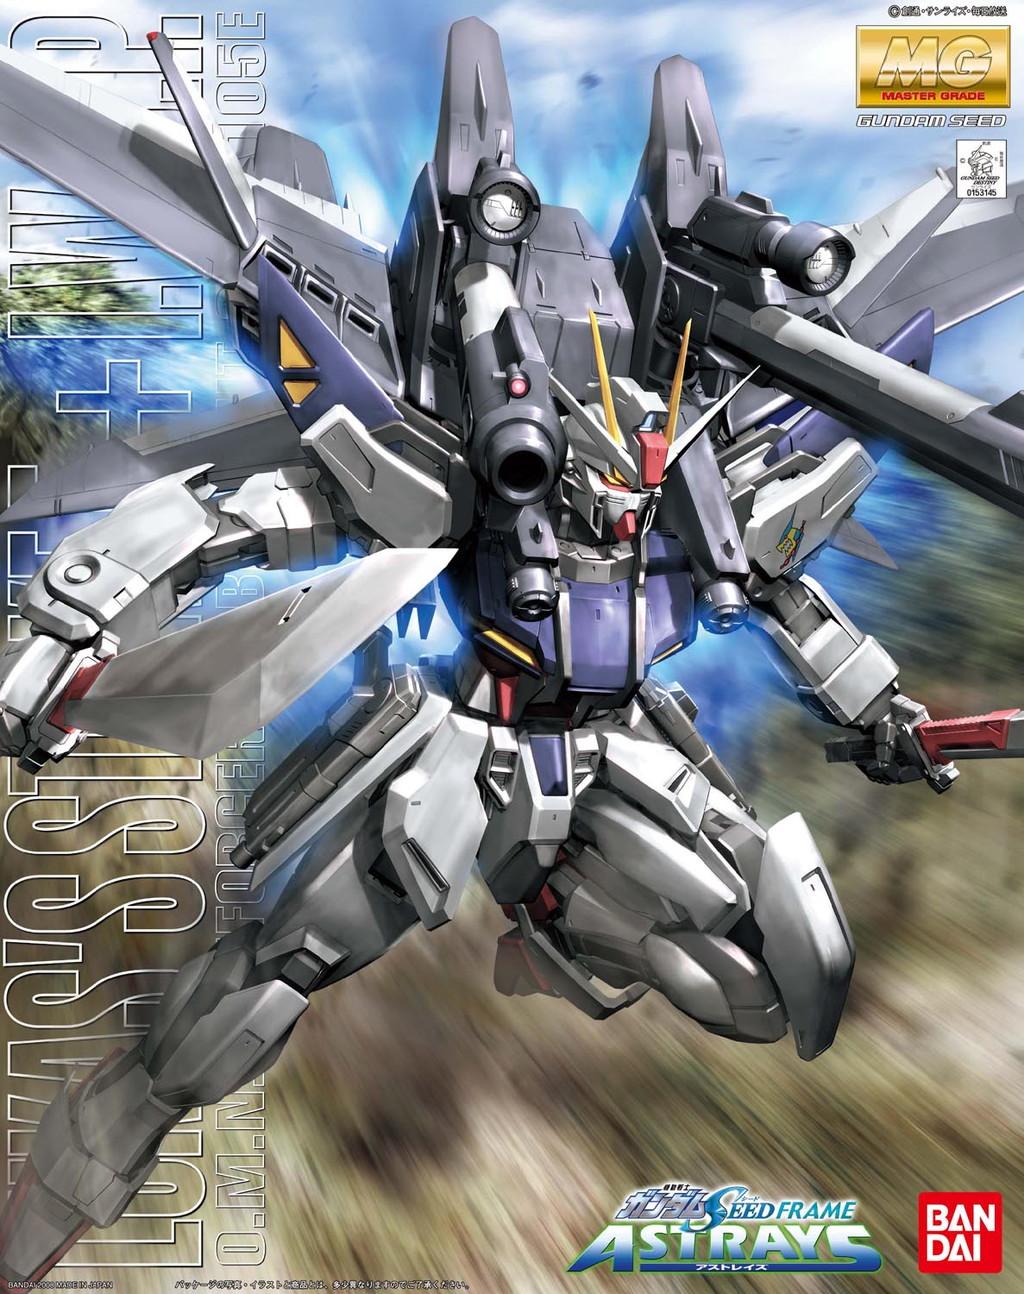 MG 1/100 GAT-X105E ストライクE+I.W.S.P. ルカス・オドネル専用機 [Lukas's Strike E + I.W.S.P.]